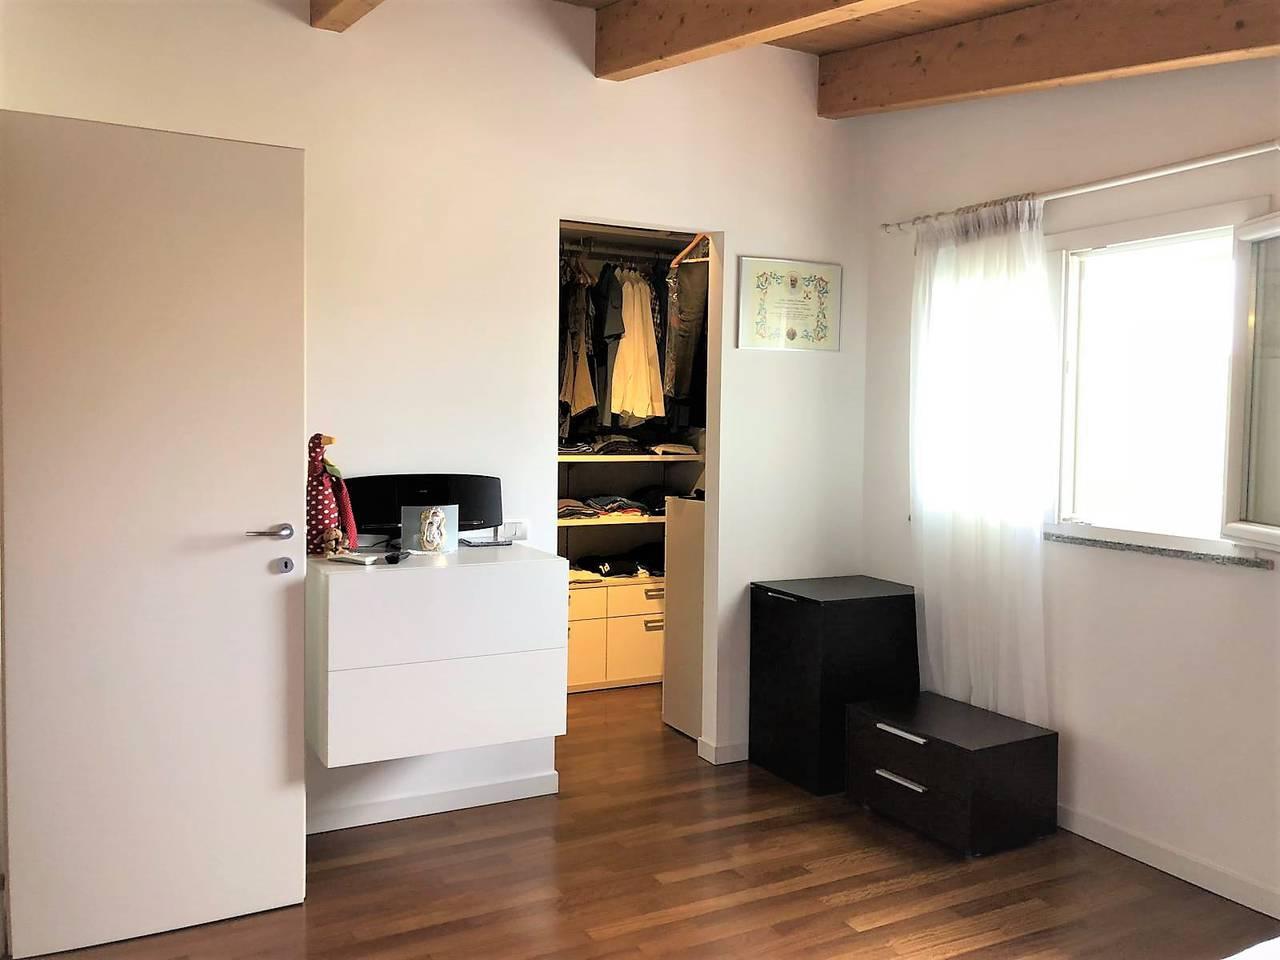 Appartamento-in-vendita-a-Busnago-in-Brianza-13